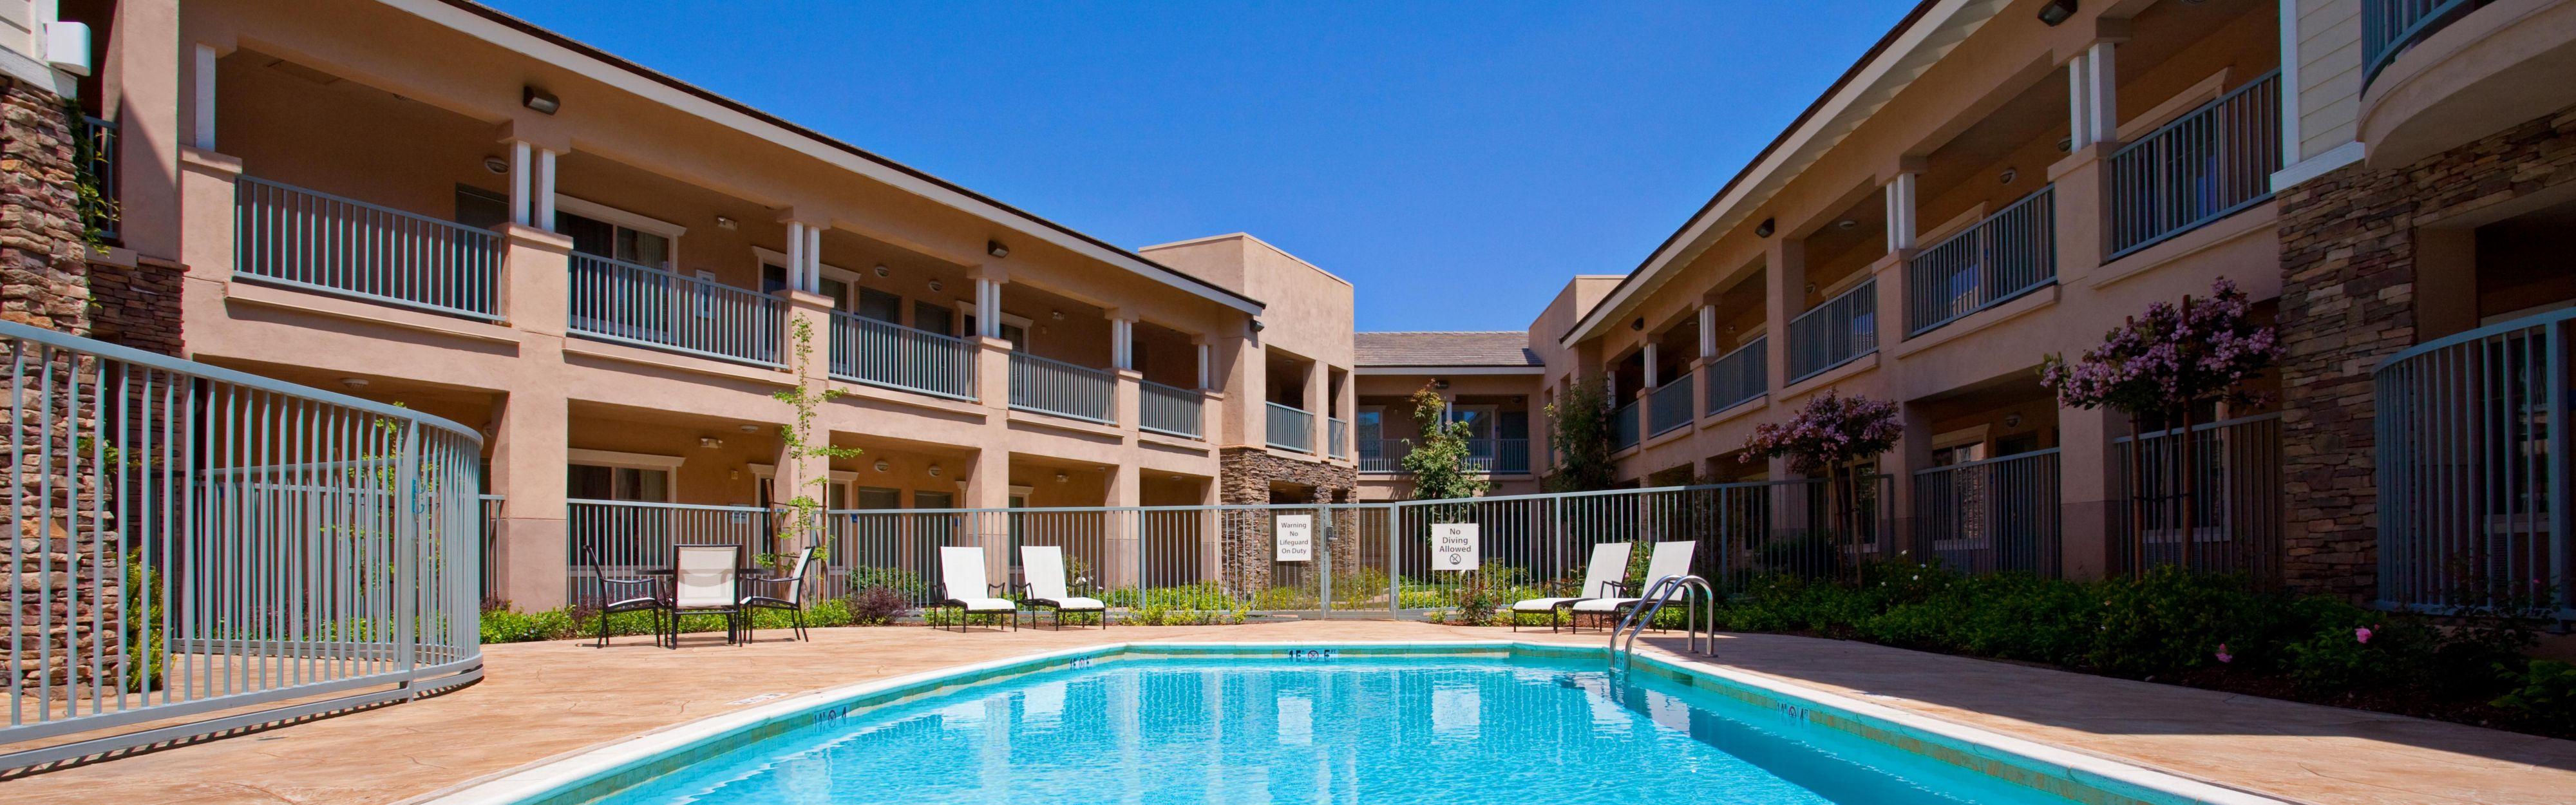 $79+ Hotels Near Universal Studios in Los Angeles CA